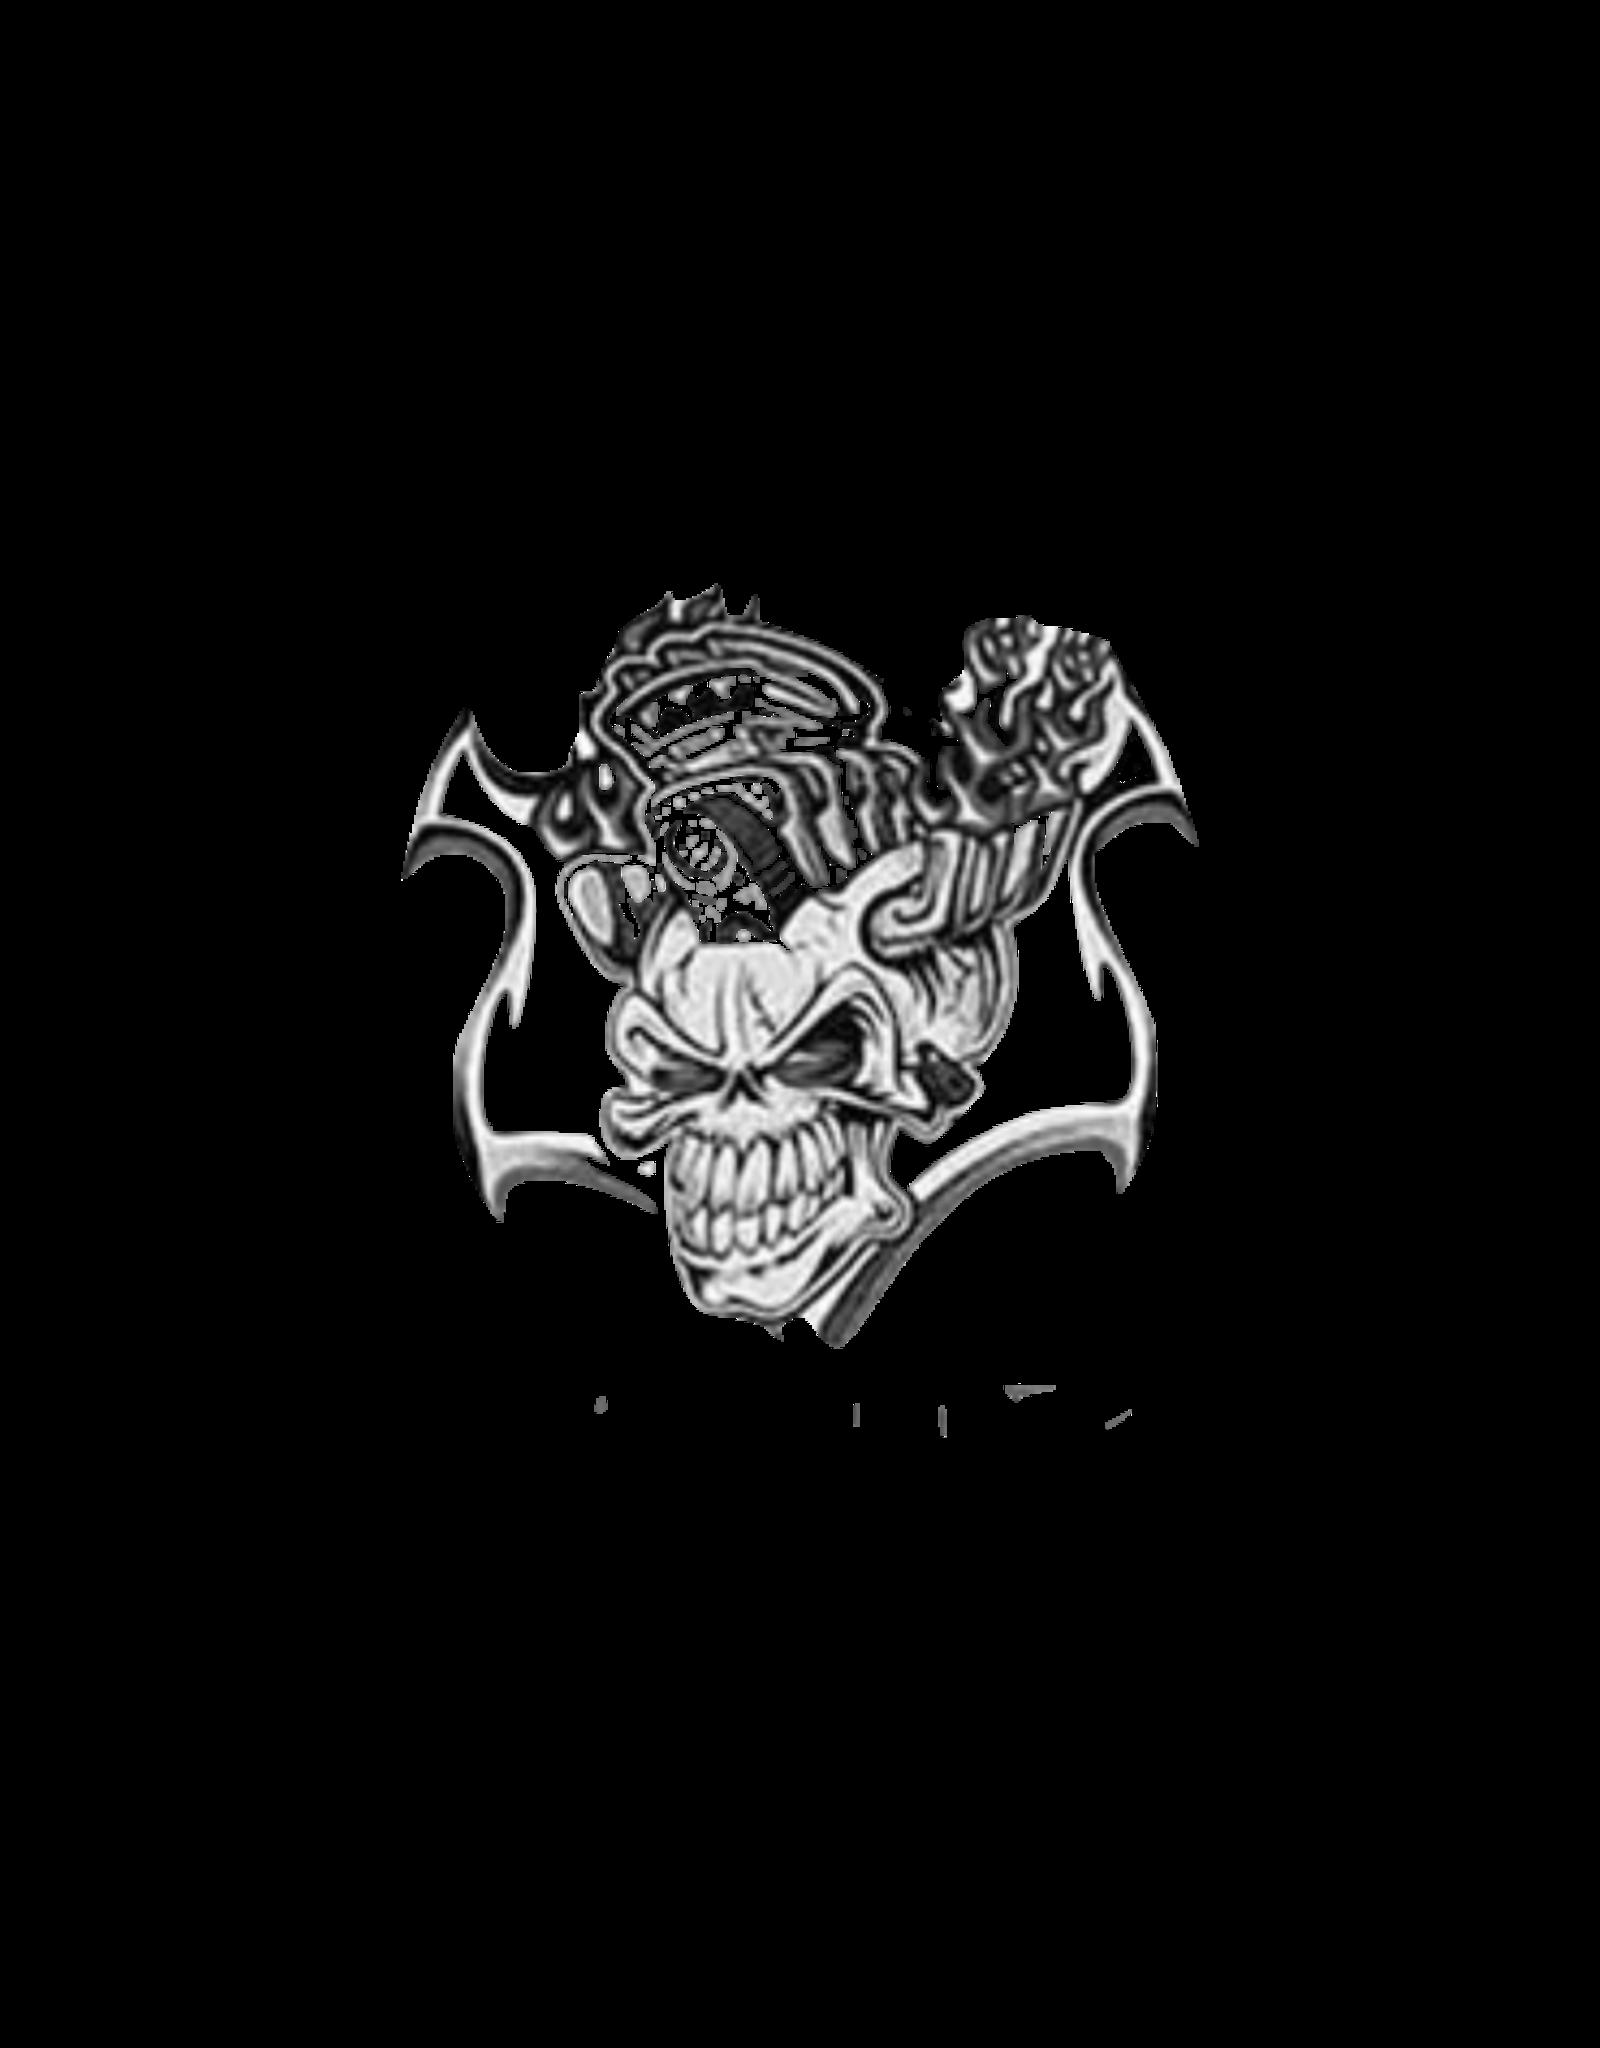 Demon Killer Demon Killer Aspire Cleito Drip Tip